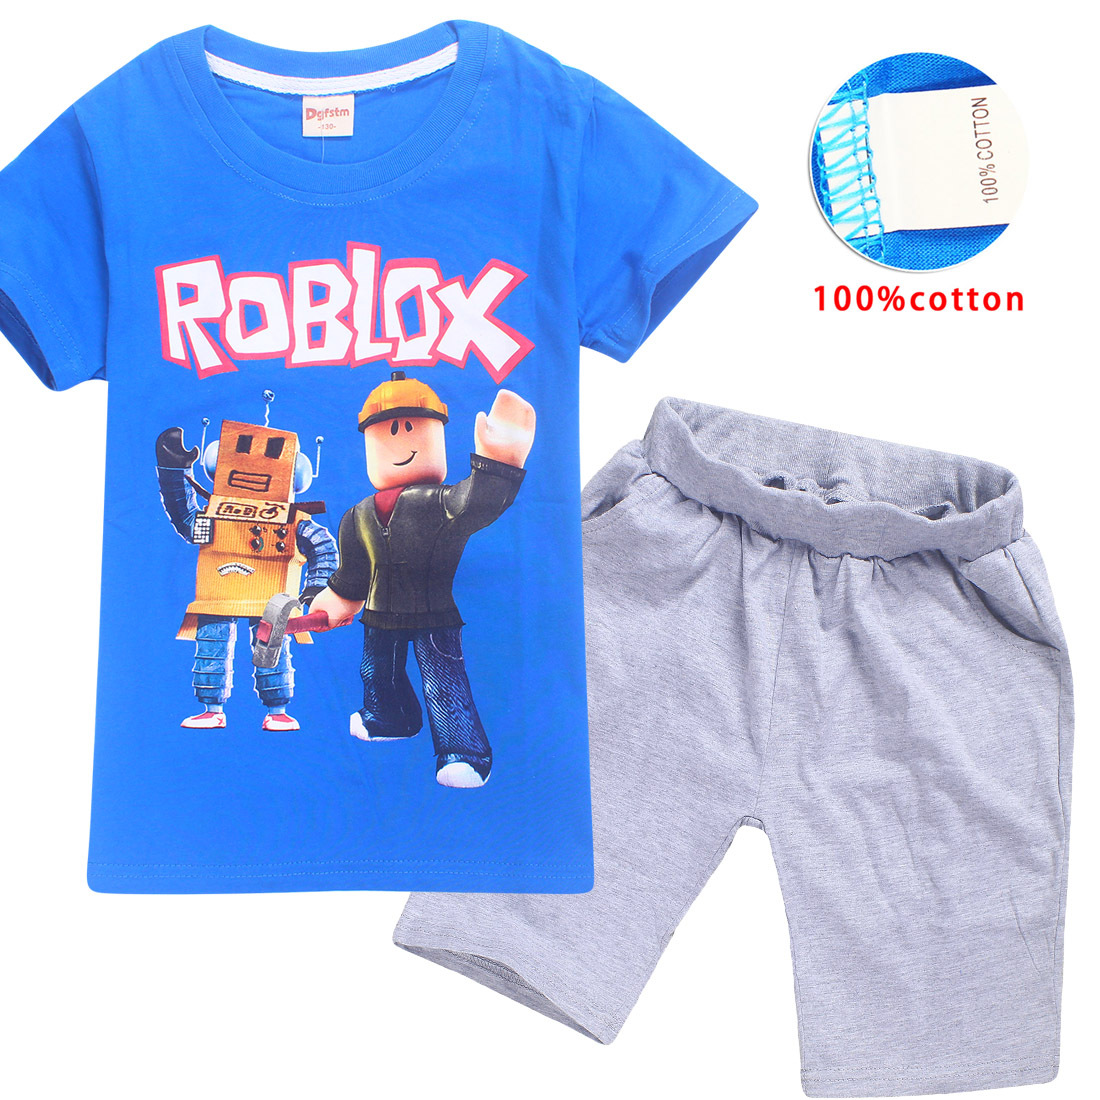 Free Shirts On Roblox - DREAMWORKS